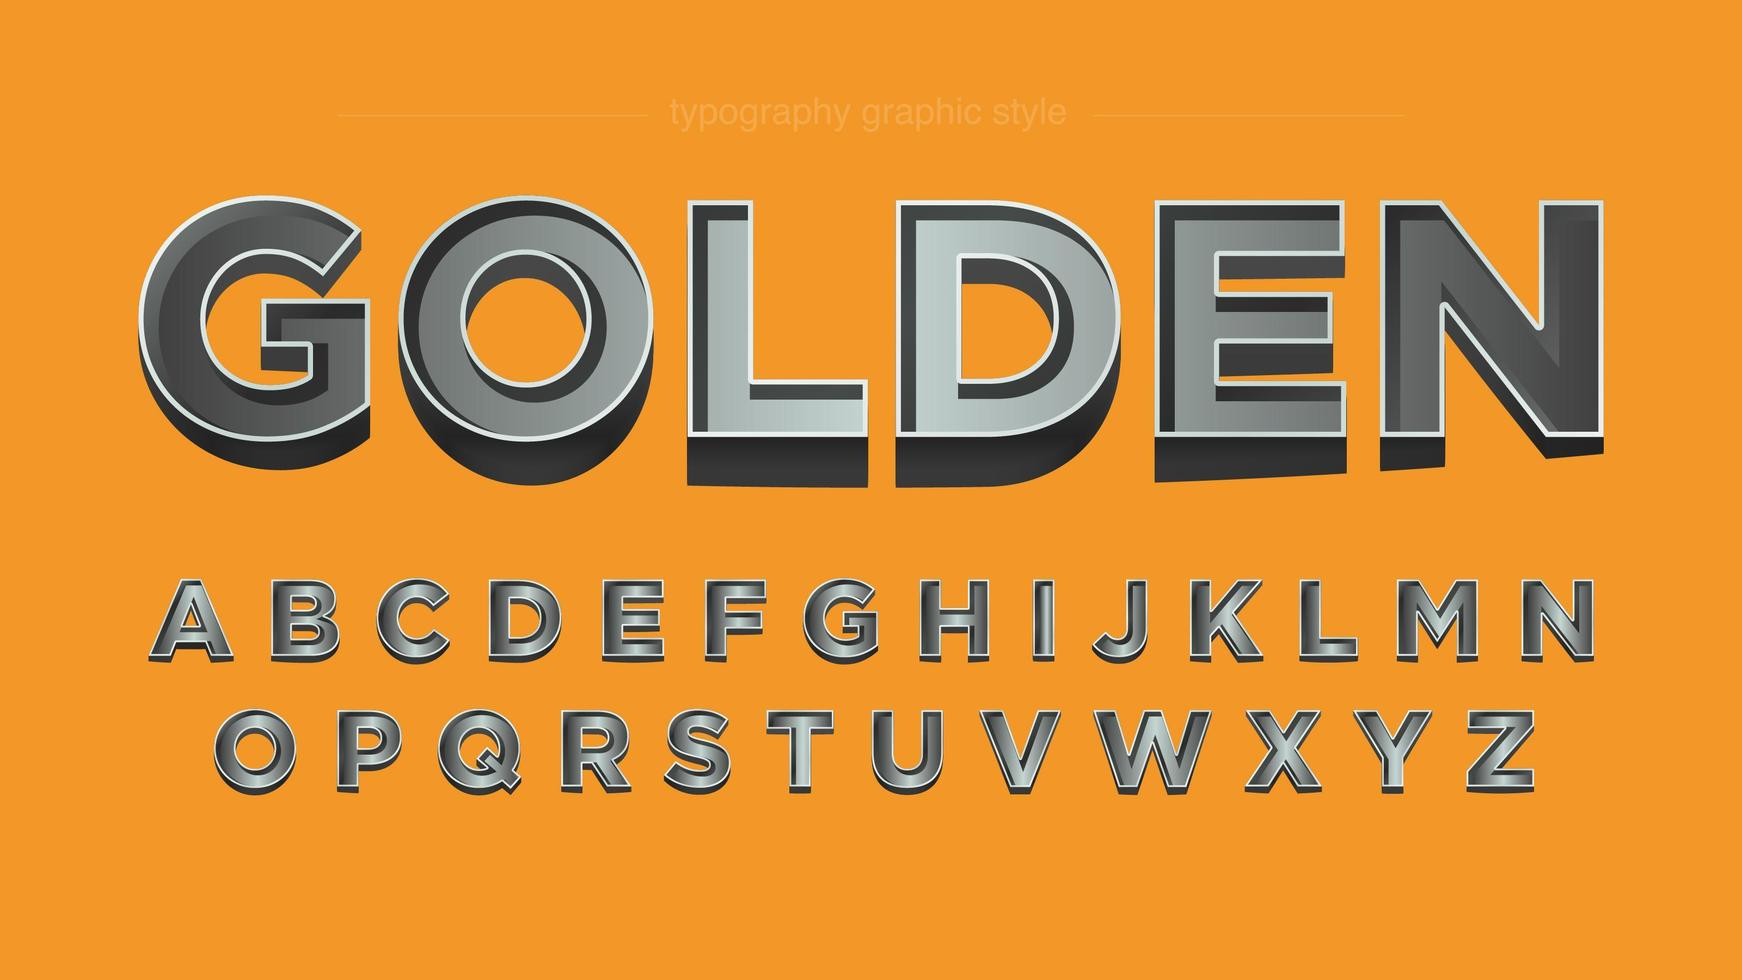 Chrome Metallic Bold 3D Typography